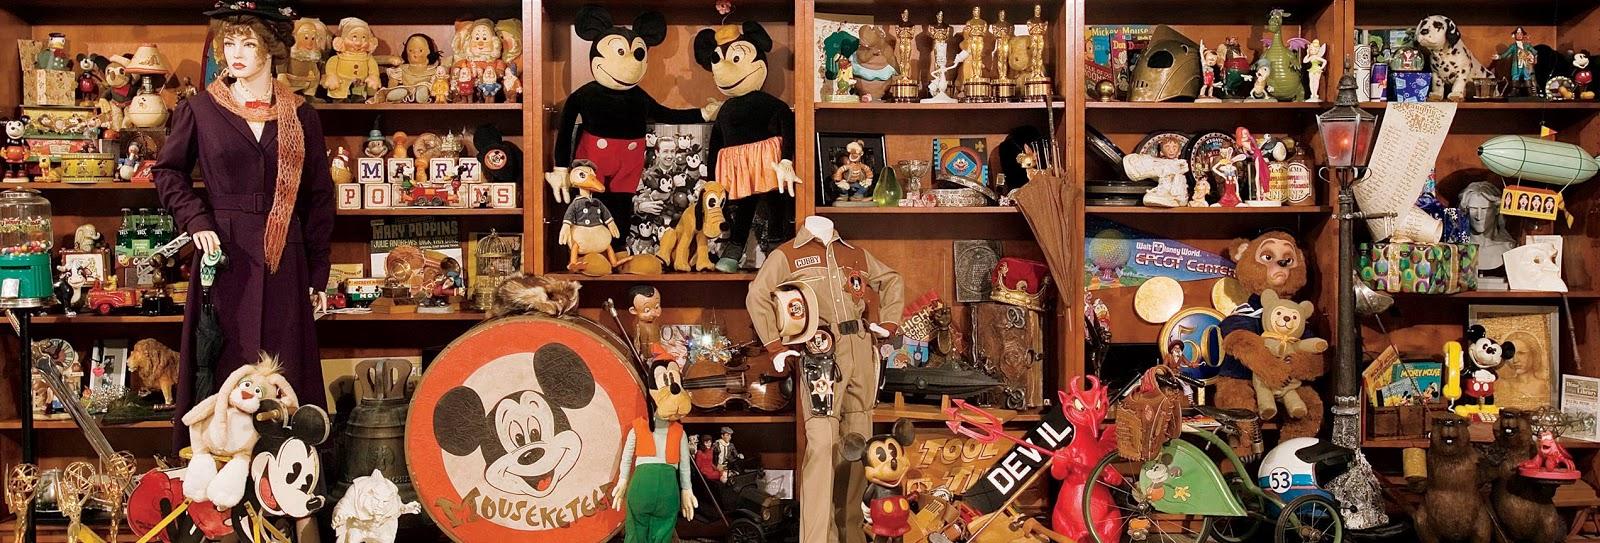 Via Walt Disney Archives Facebook